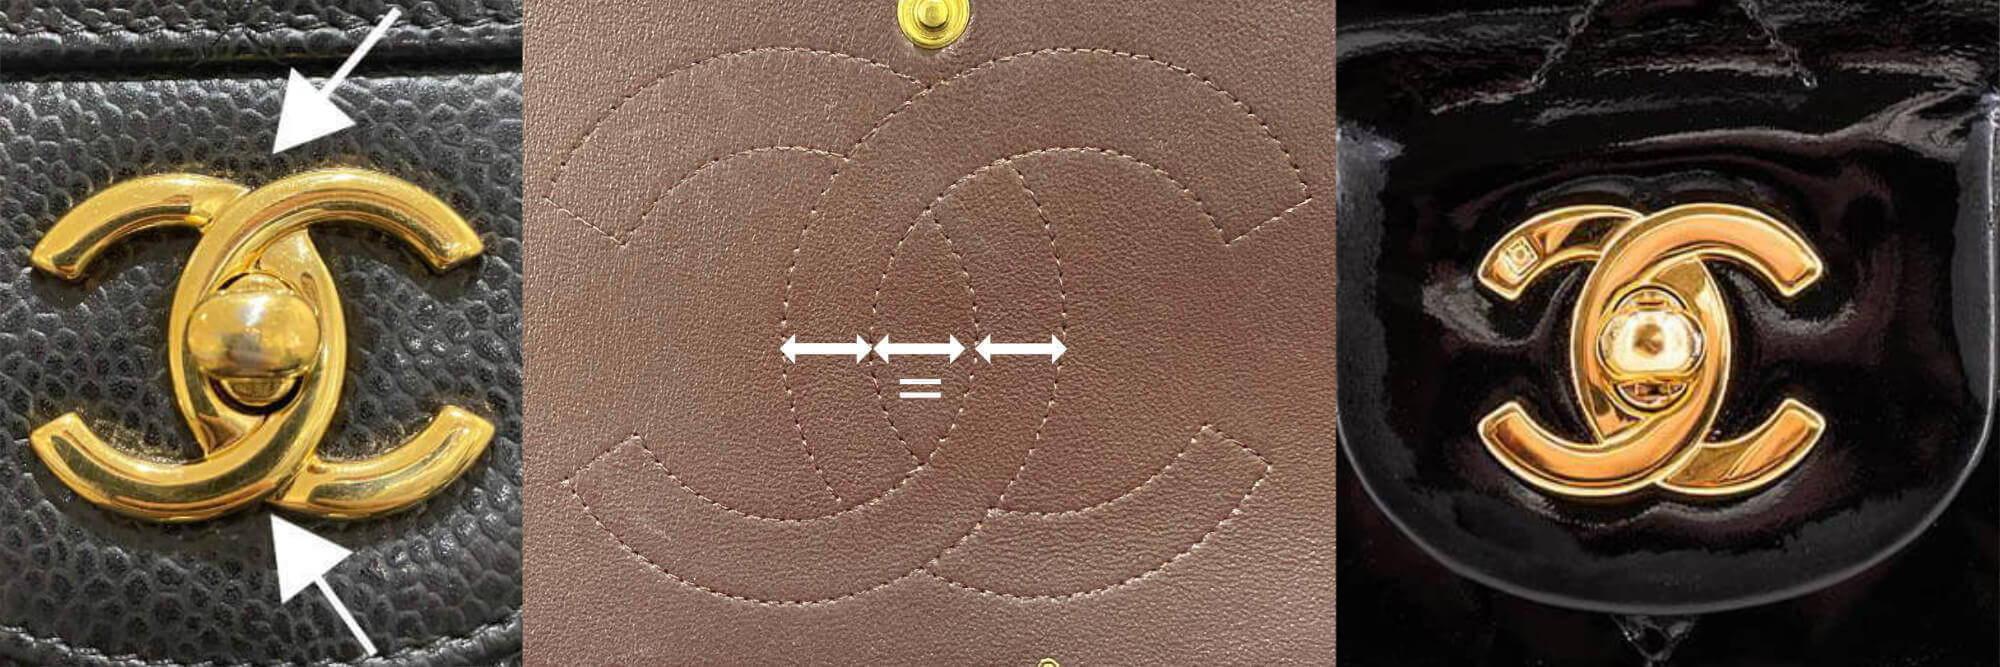 Authentic Chanel logo locks and stitching